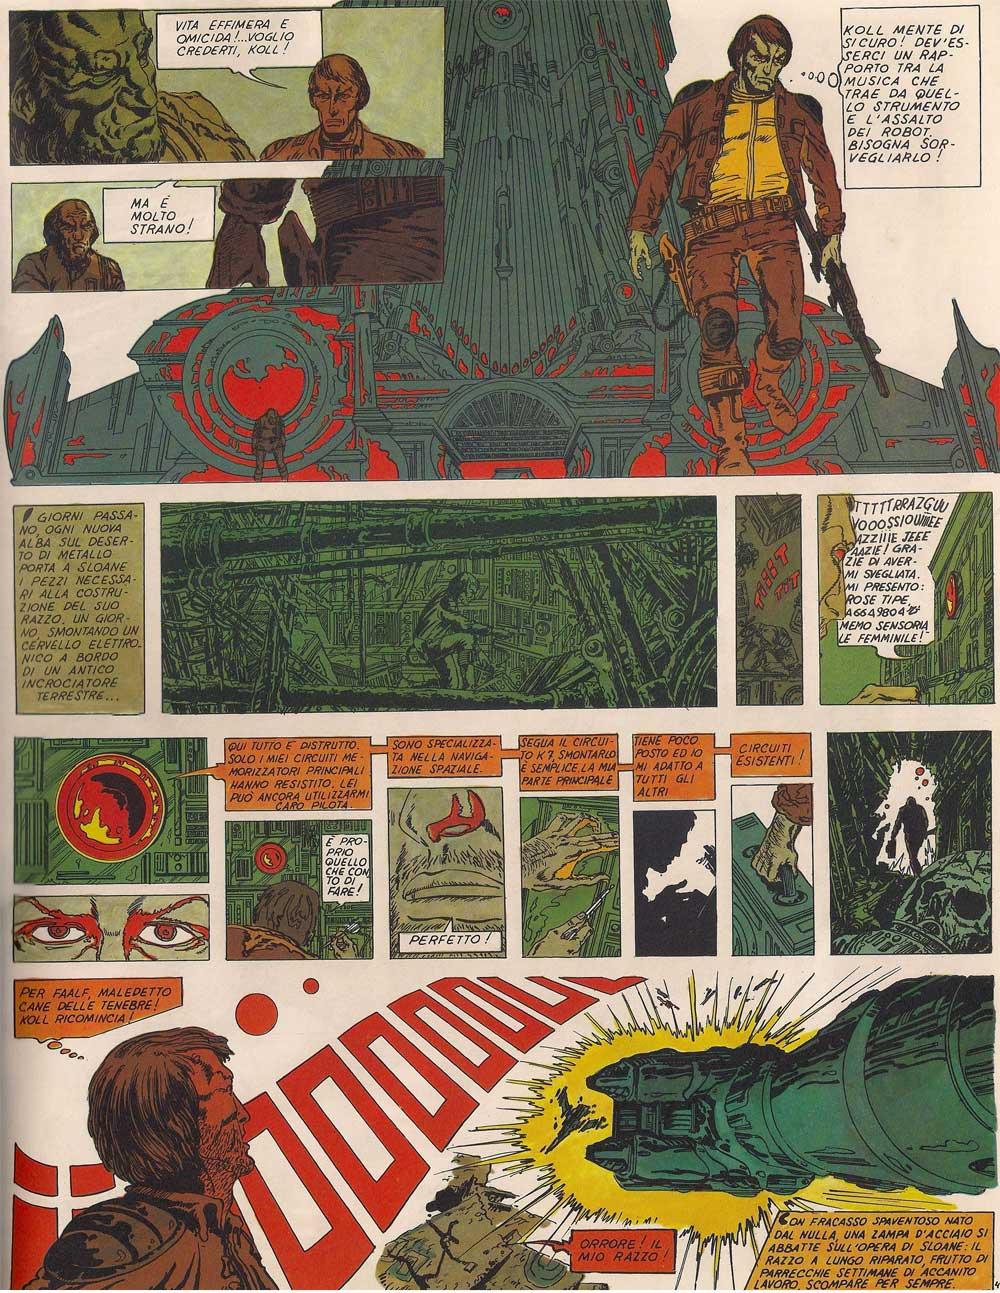 300-i-viaggi-fantastici-di-lone-sloane-3_Essential 300 comics